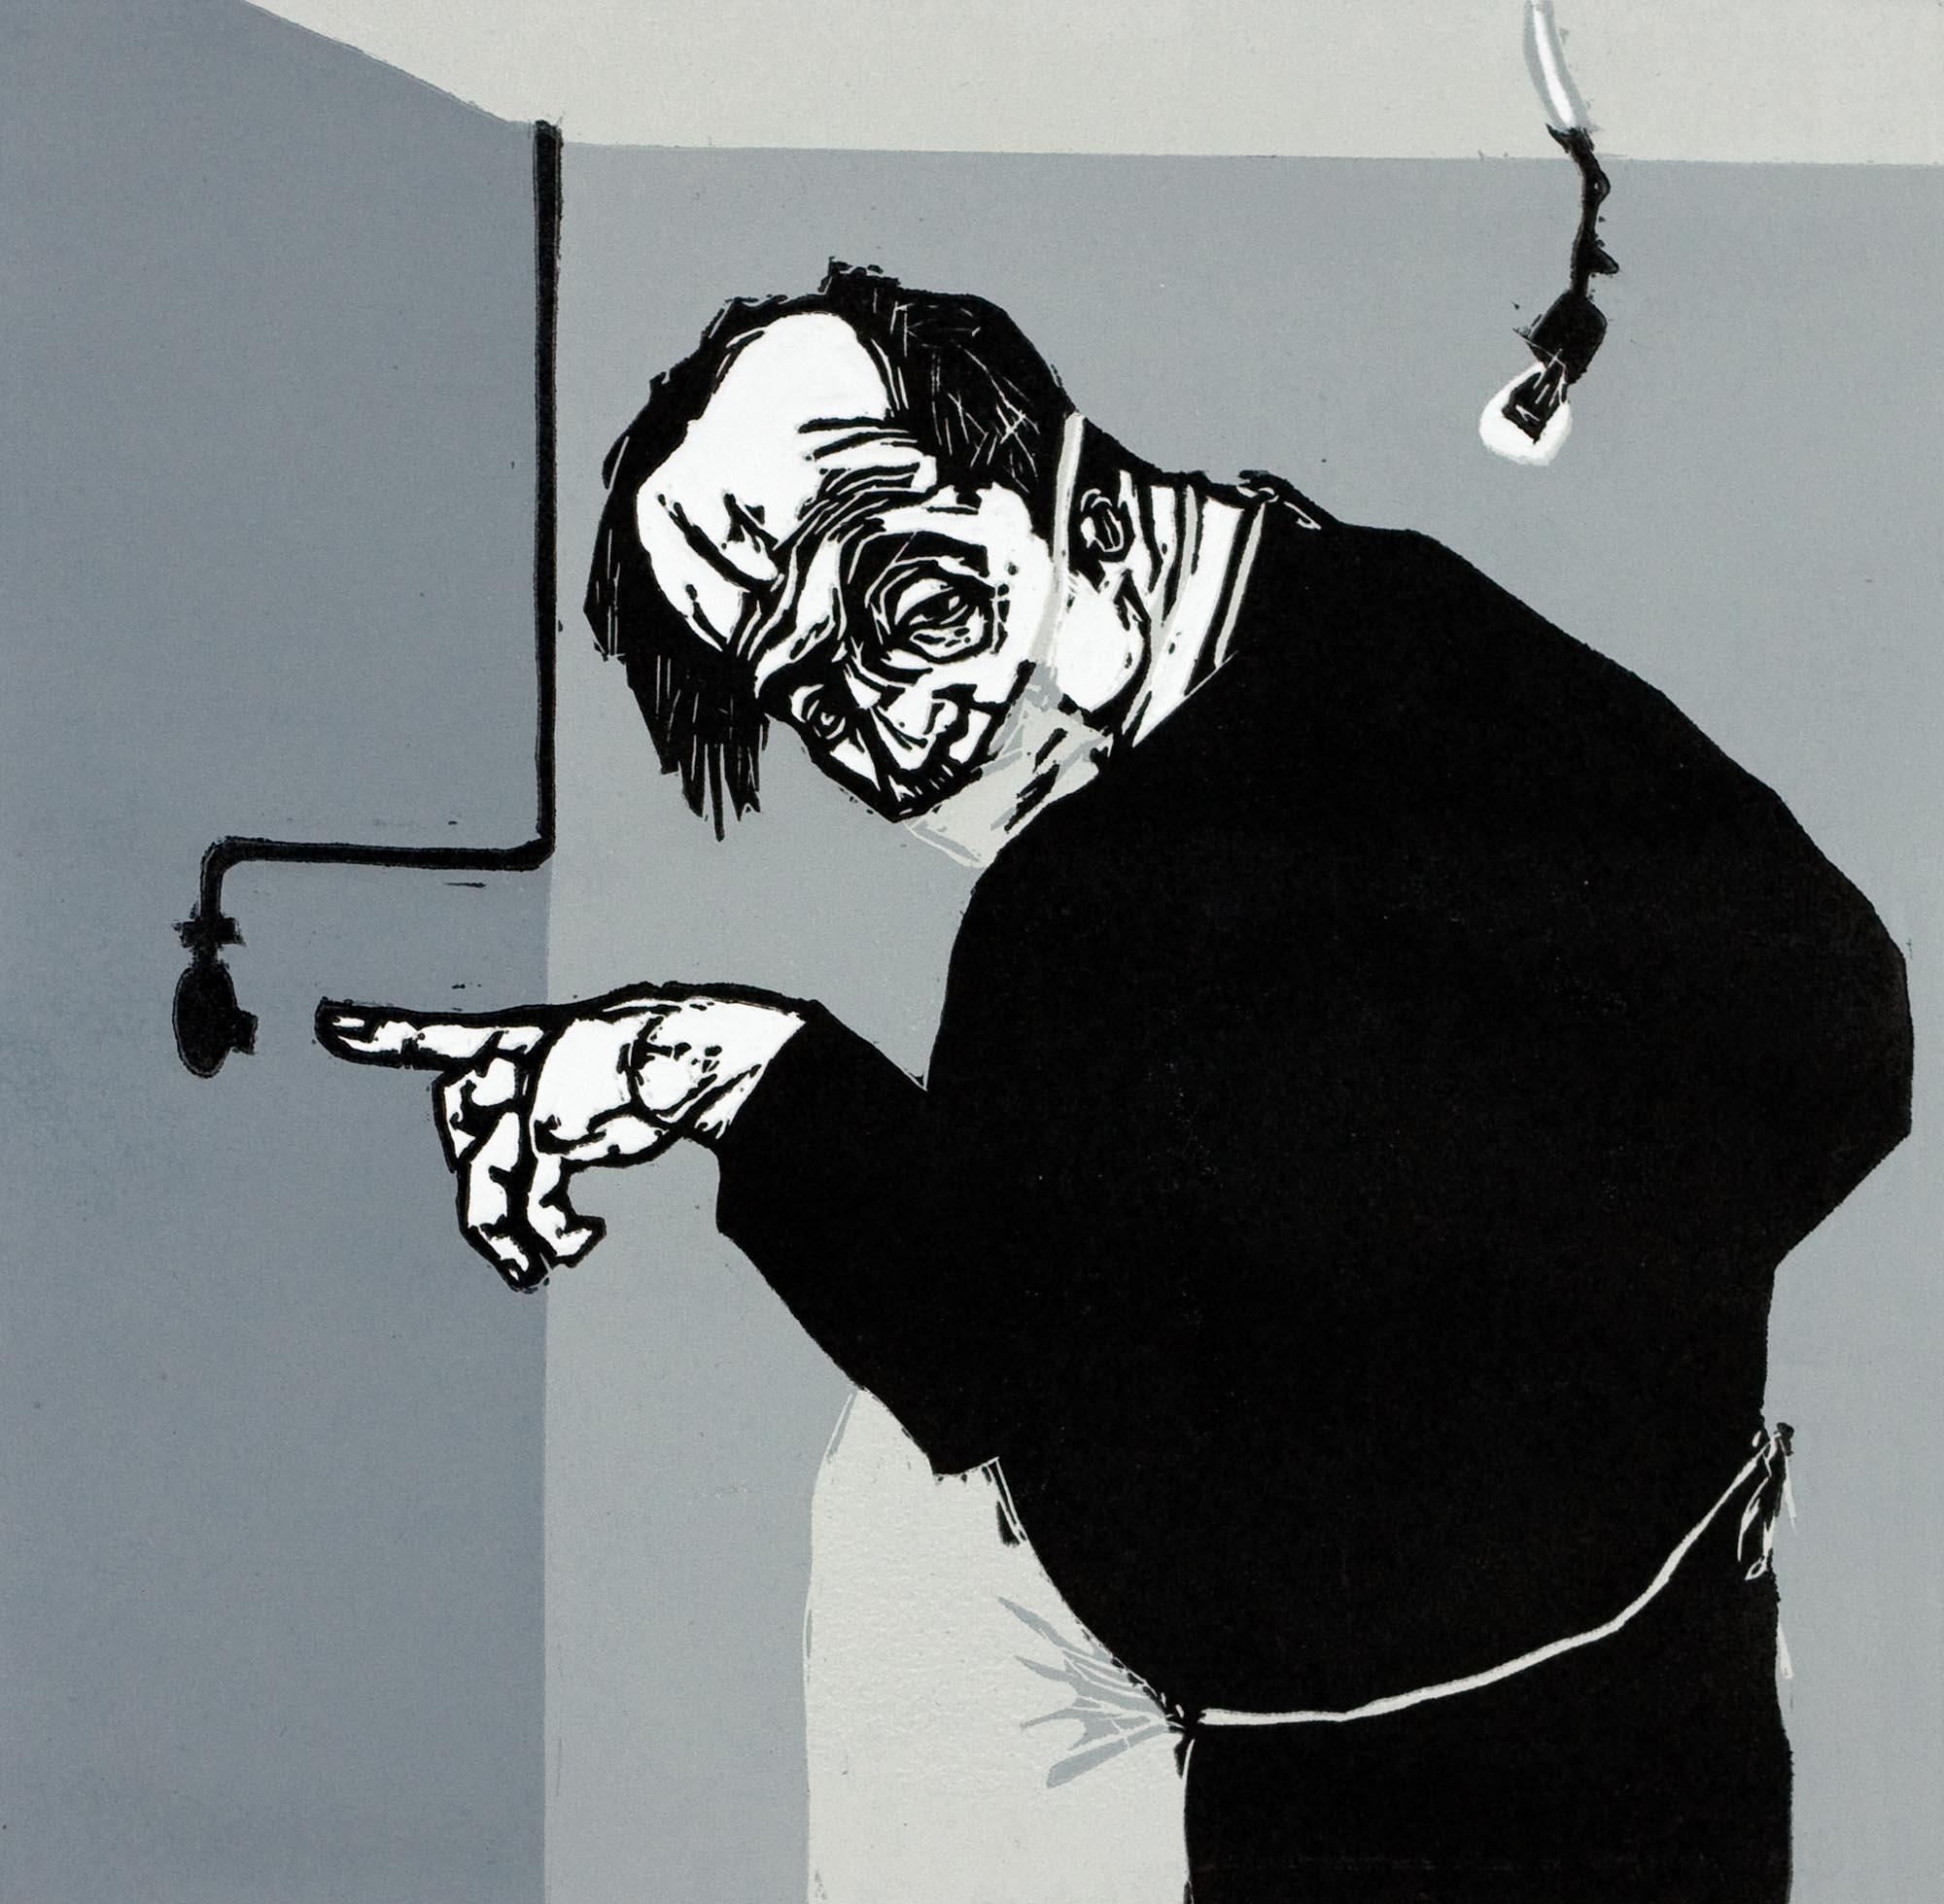 Quique Sena. Tras la mirilla I, 2005. Xilografía,  24,5 x 25 cm (imagen).